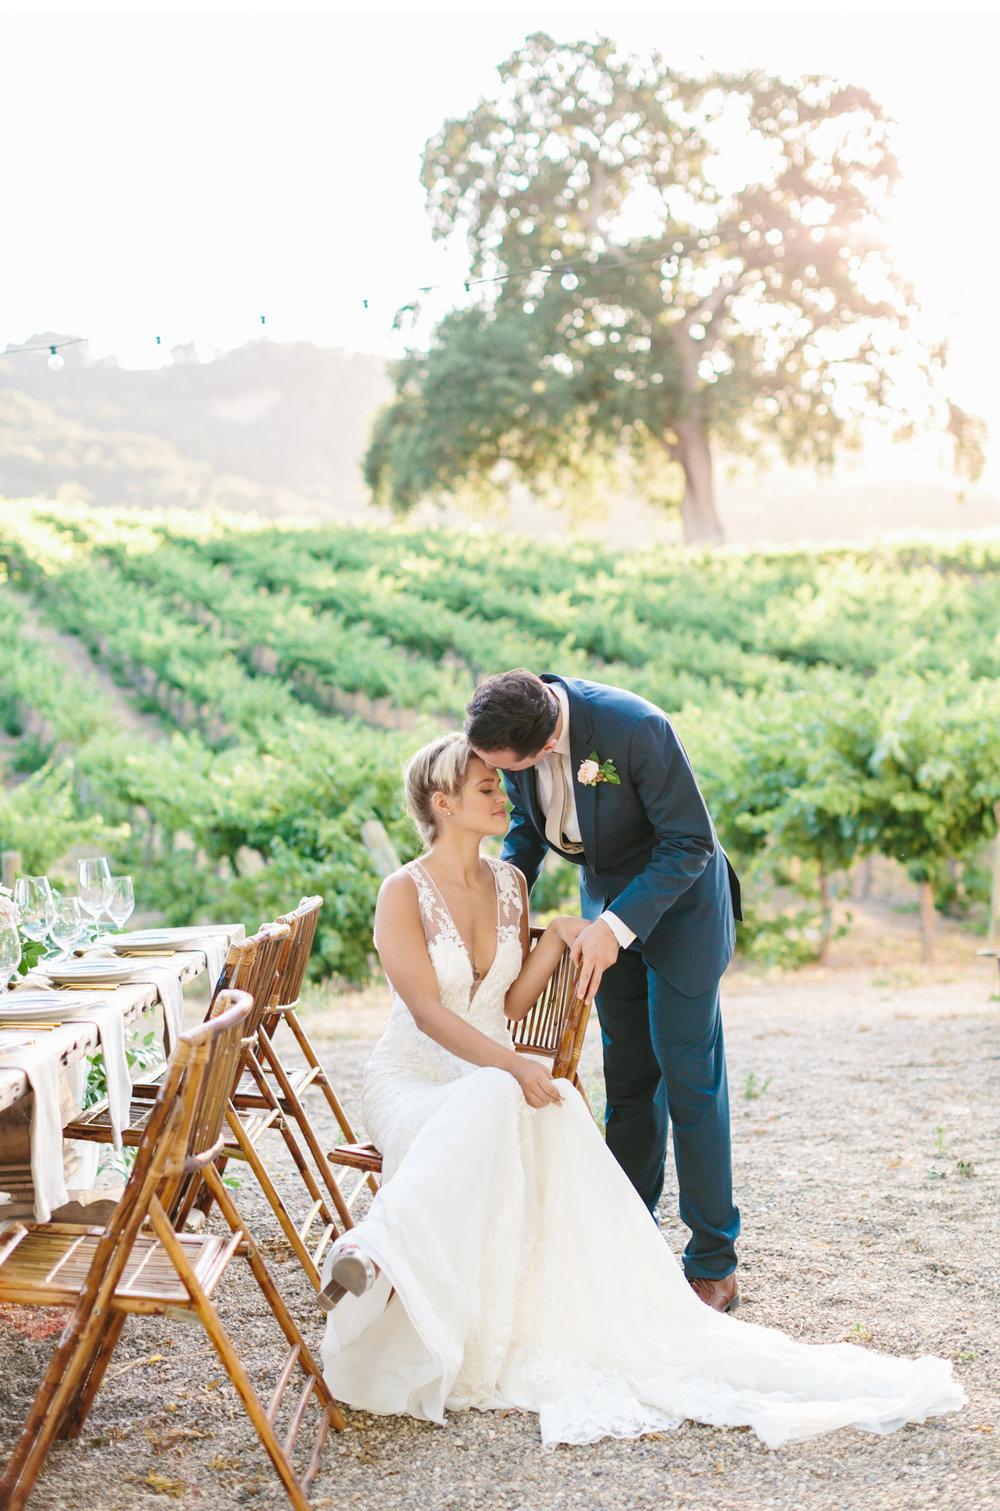 San-Luis-Obispo-Weddings-Natalie-Schutt-Wedding-Photography_02.jpg